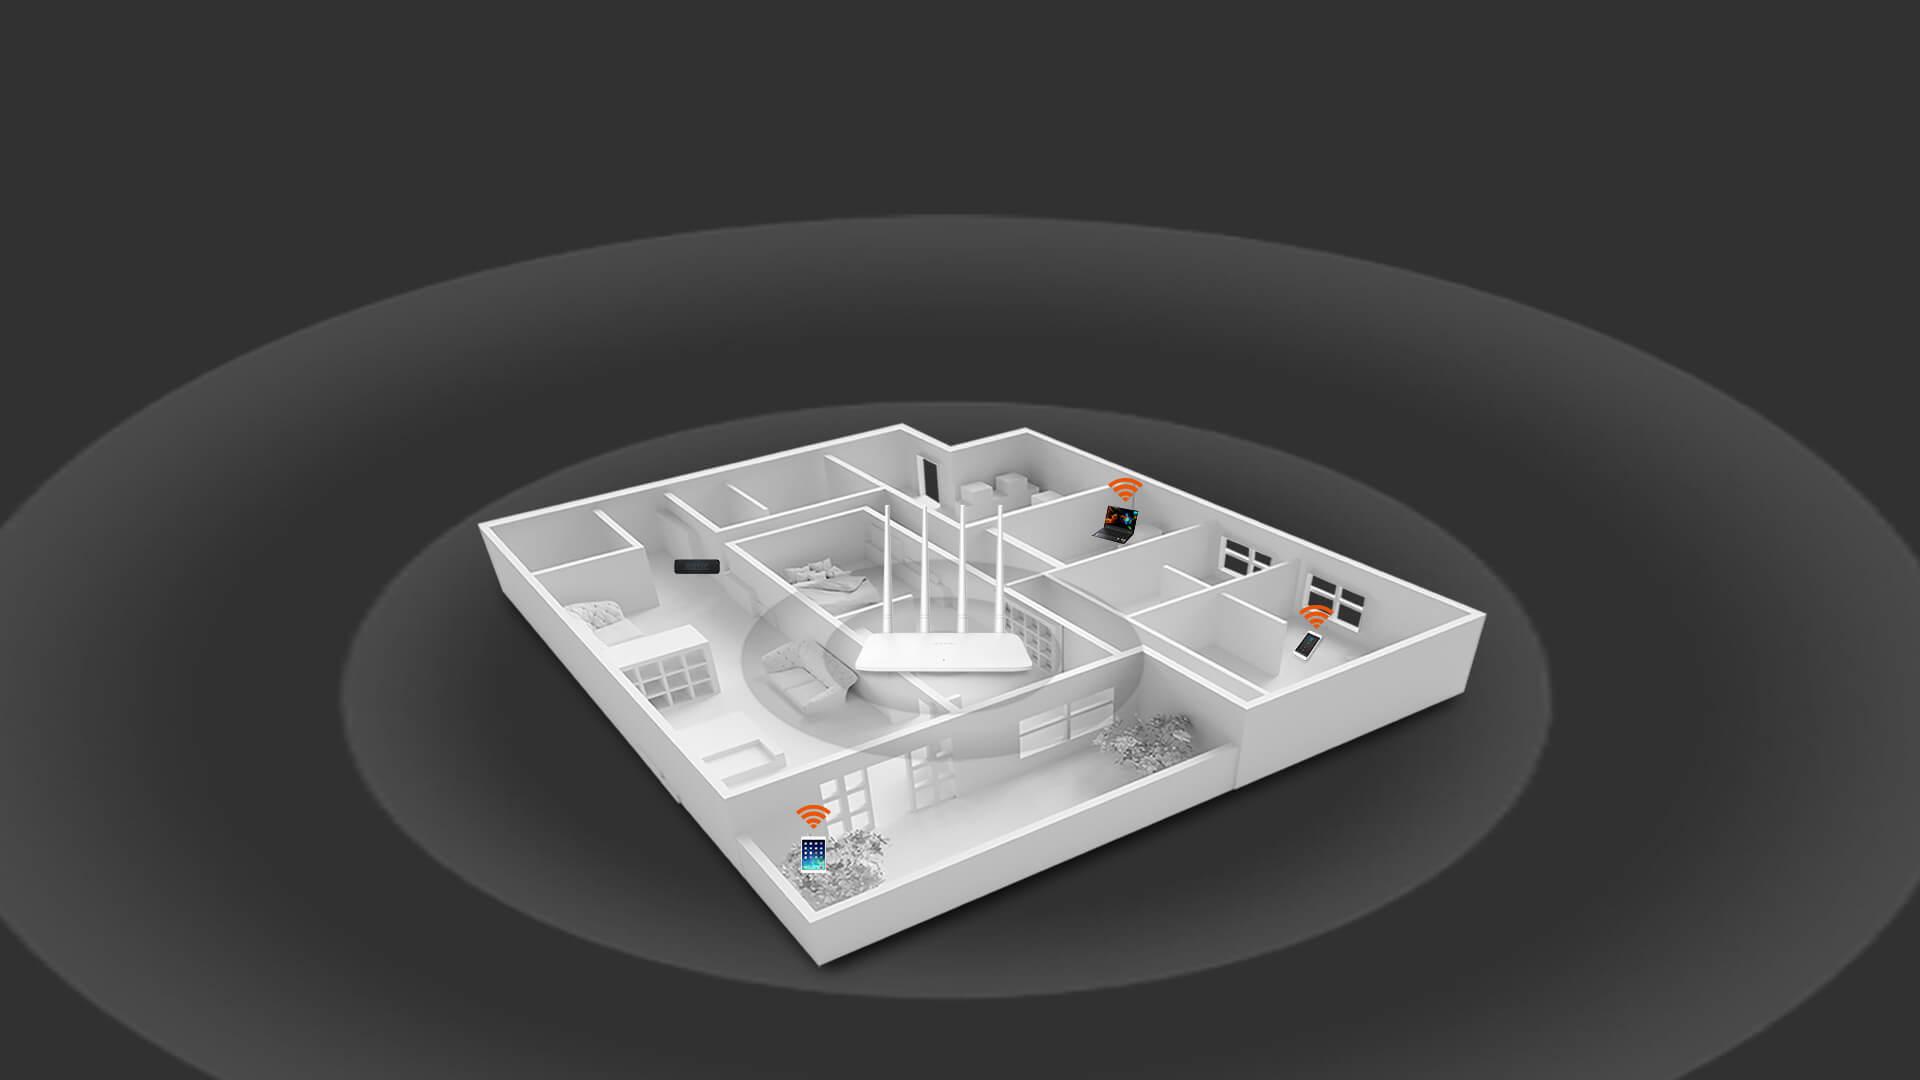 Thiết bị mạng Router Tenda F6-3